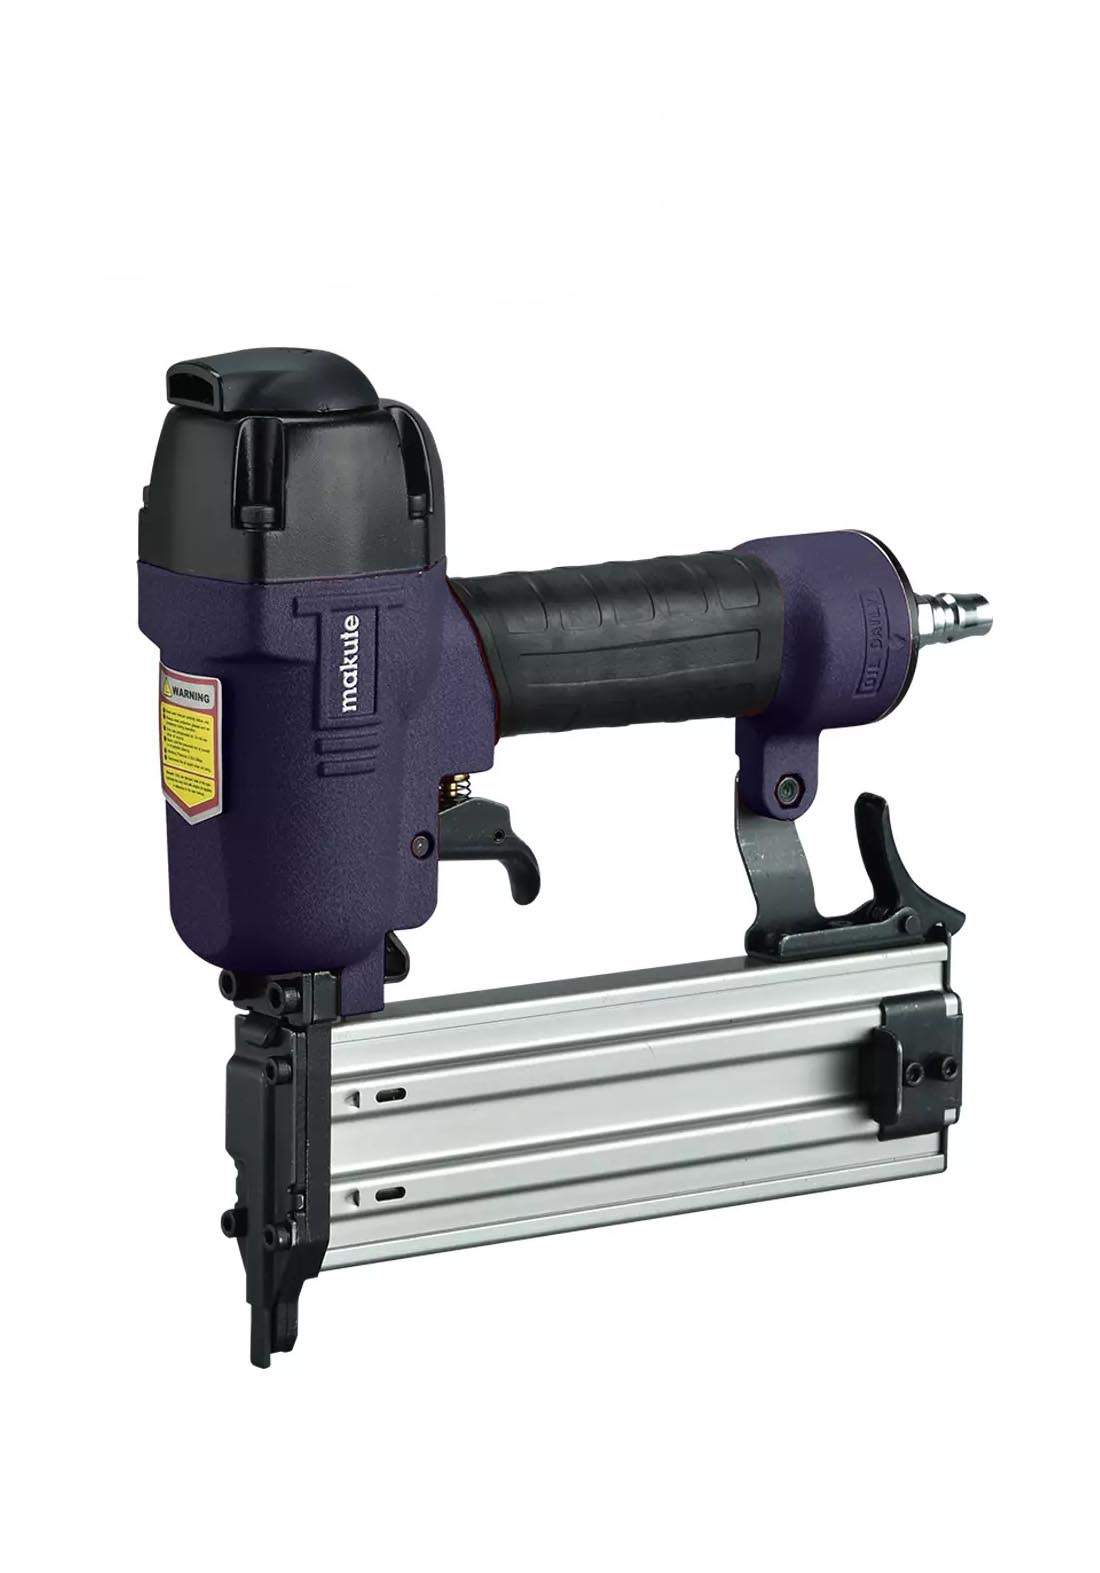 Makute F50A Nail Gun Stapler Pneumatic tools مسدس ضغط المسامير